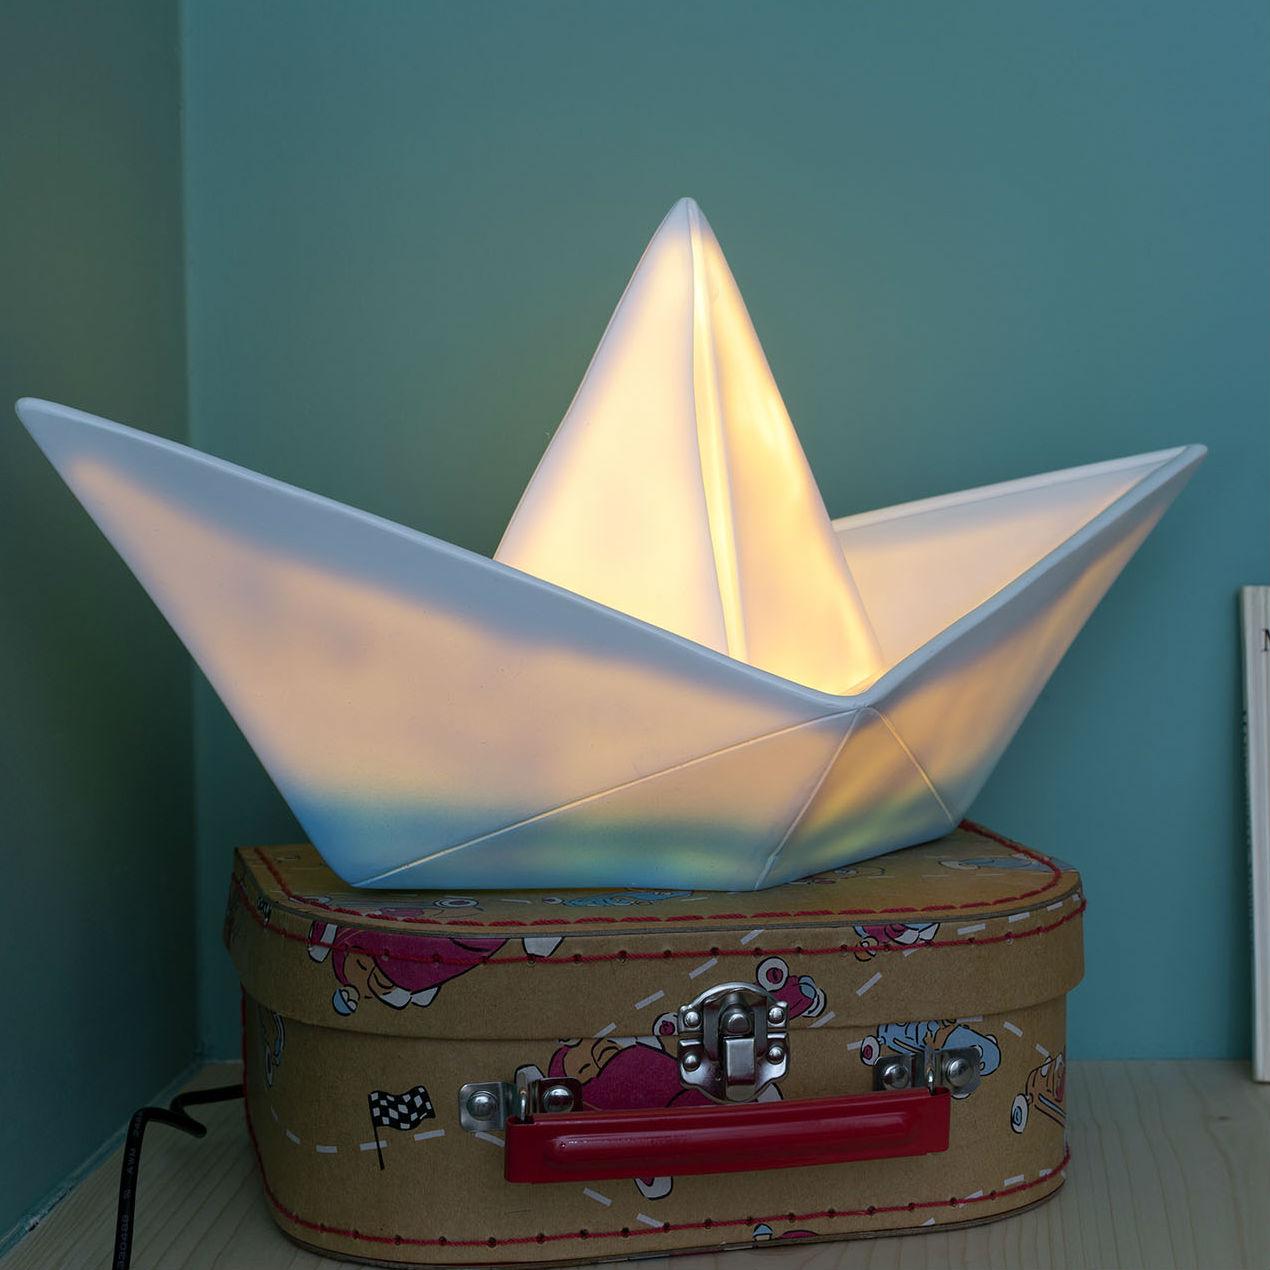 lampe enfant veilleuse bateau blanc bleu l32cm goodnight light luminaires nedgis. Black Bedroom Furniture Sets. Home Design Ideas